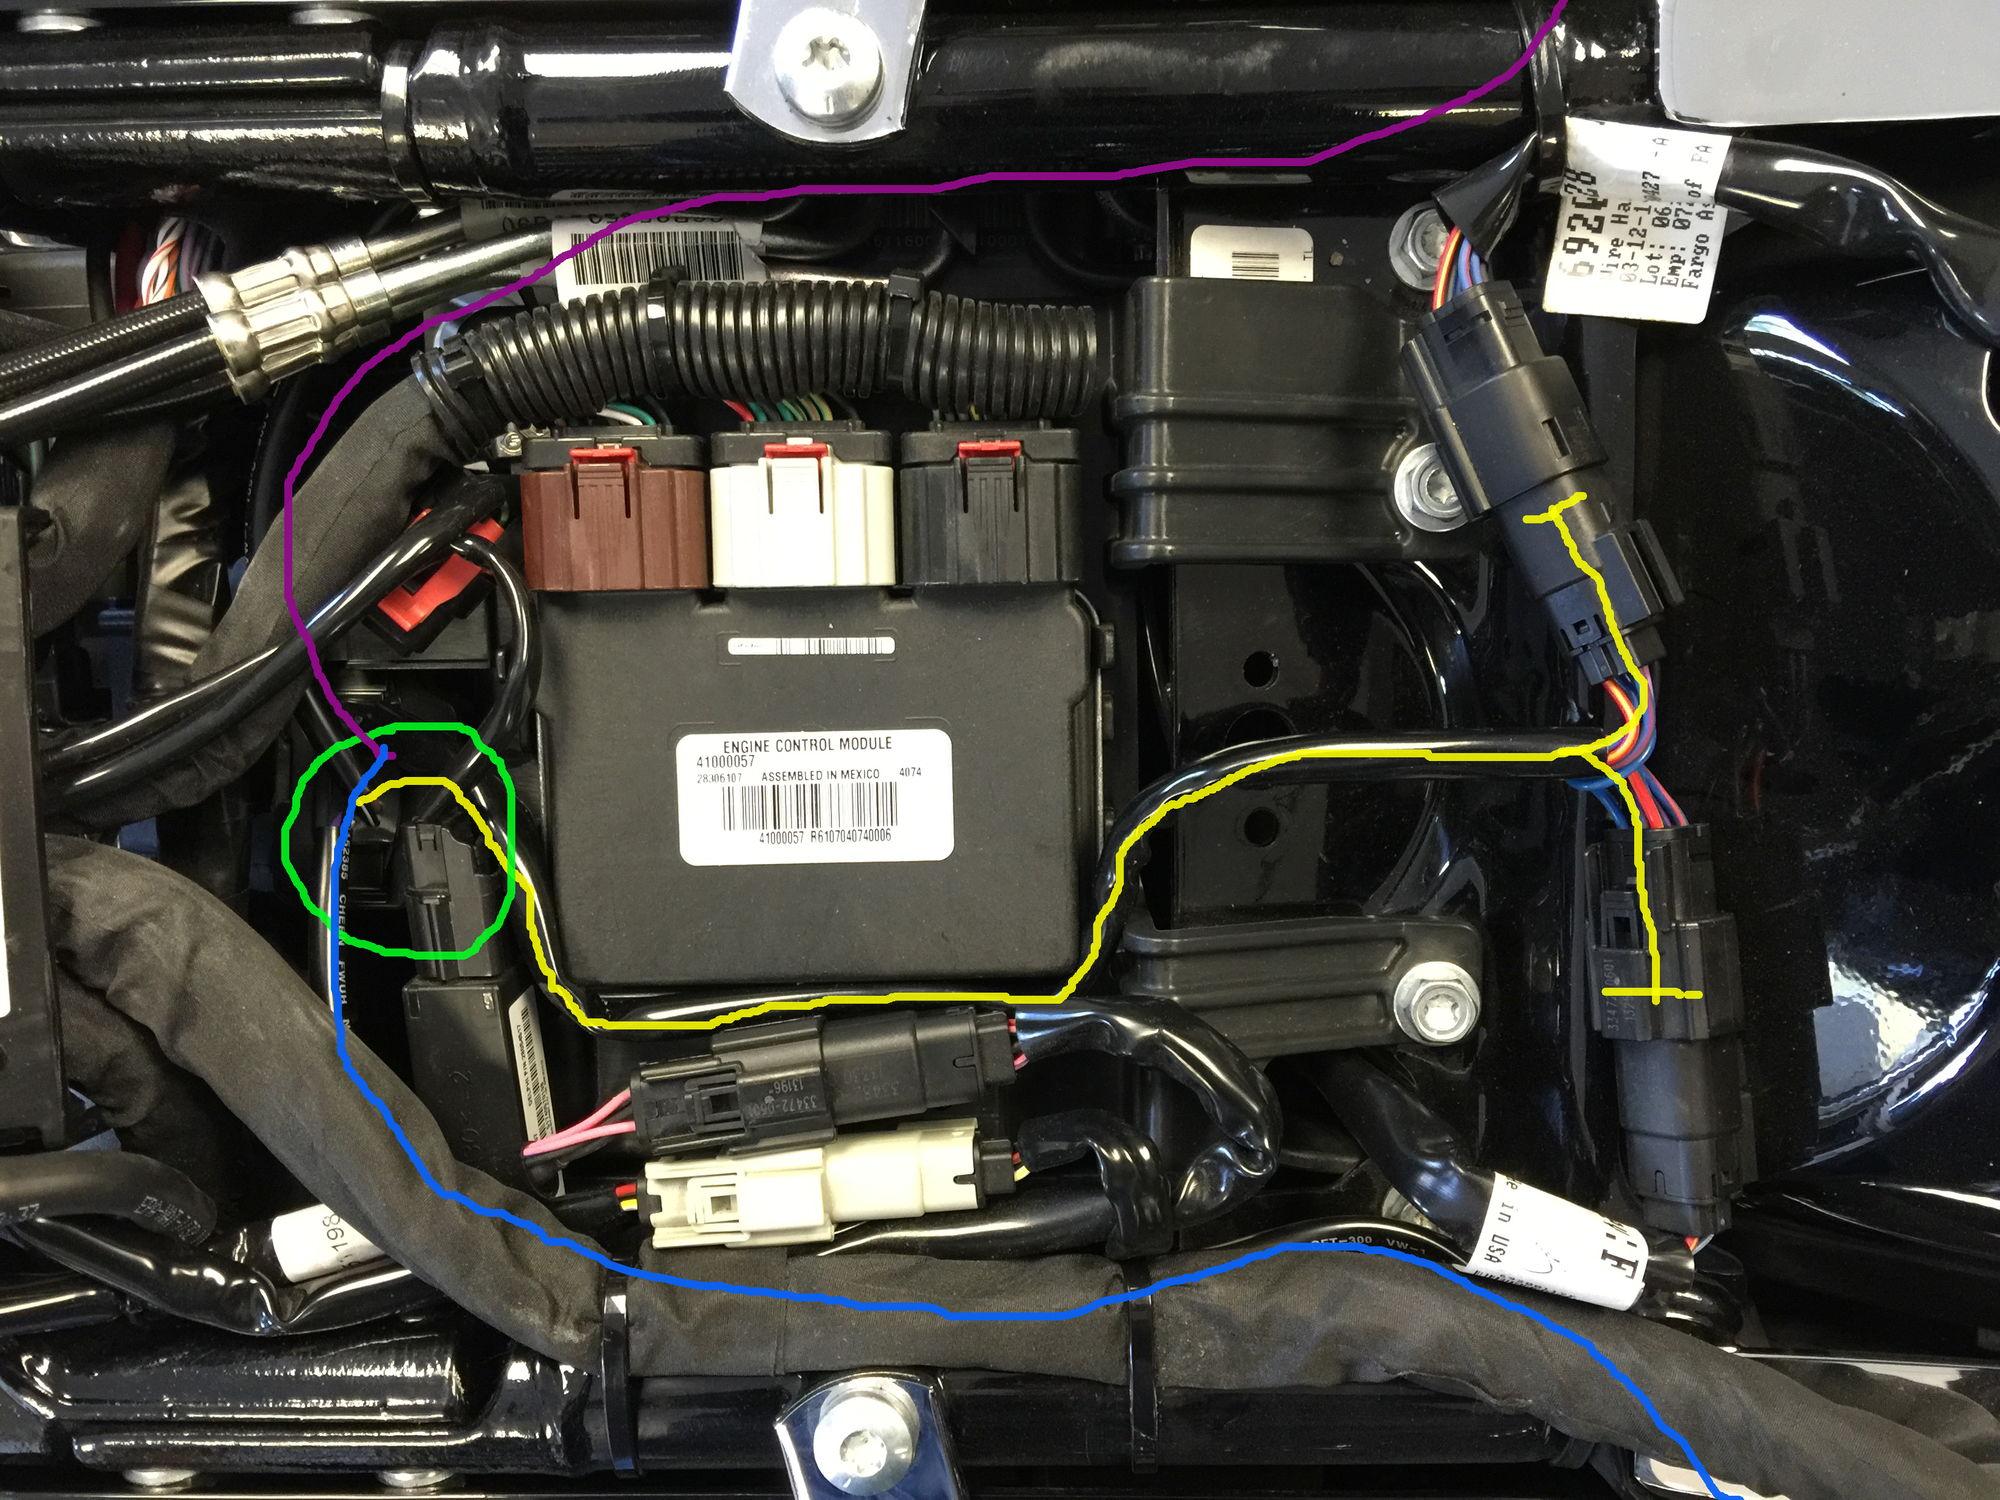 80 img_0450_1ec539a8d7359d19a3aea827b94228706cc089cb tour pack detach on '15 ultra wiring ? page 2 harley davidson  at panicattacktreatment.co